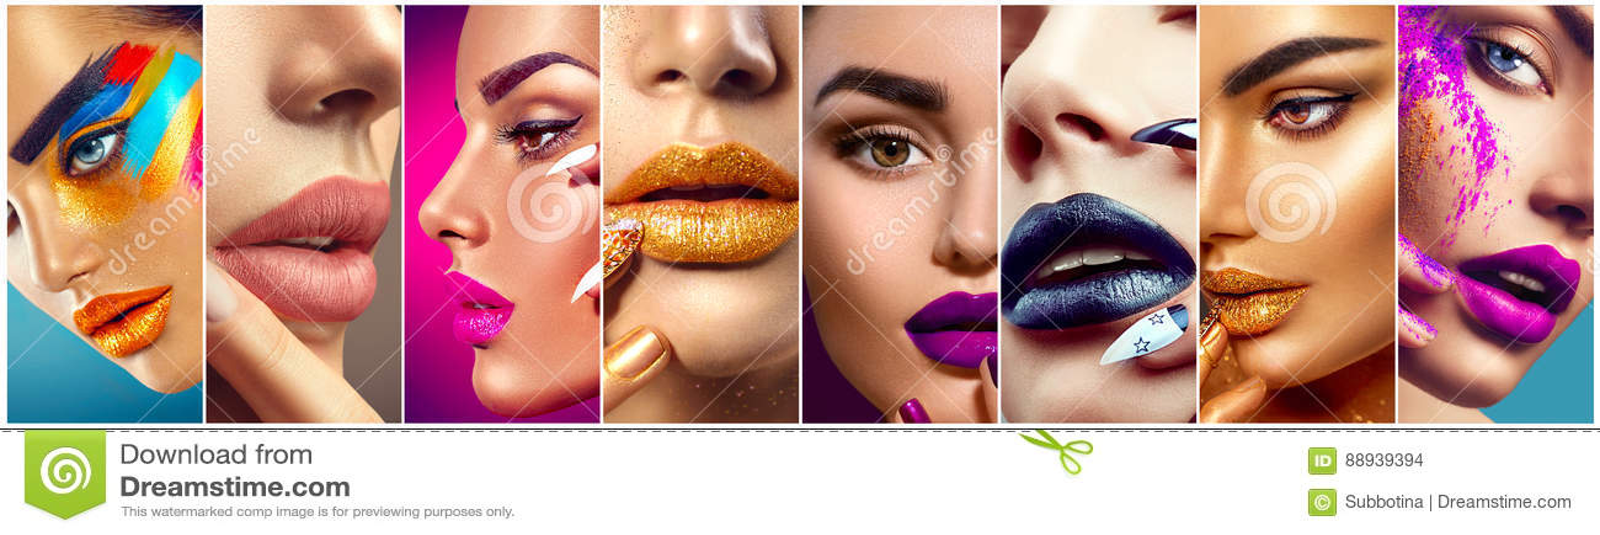 Makeup collage. Colorful lips, eyes, eyeshadows and nail art